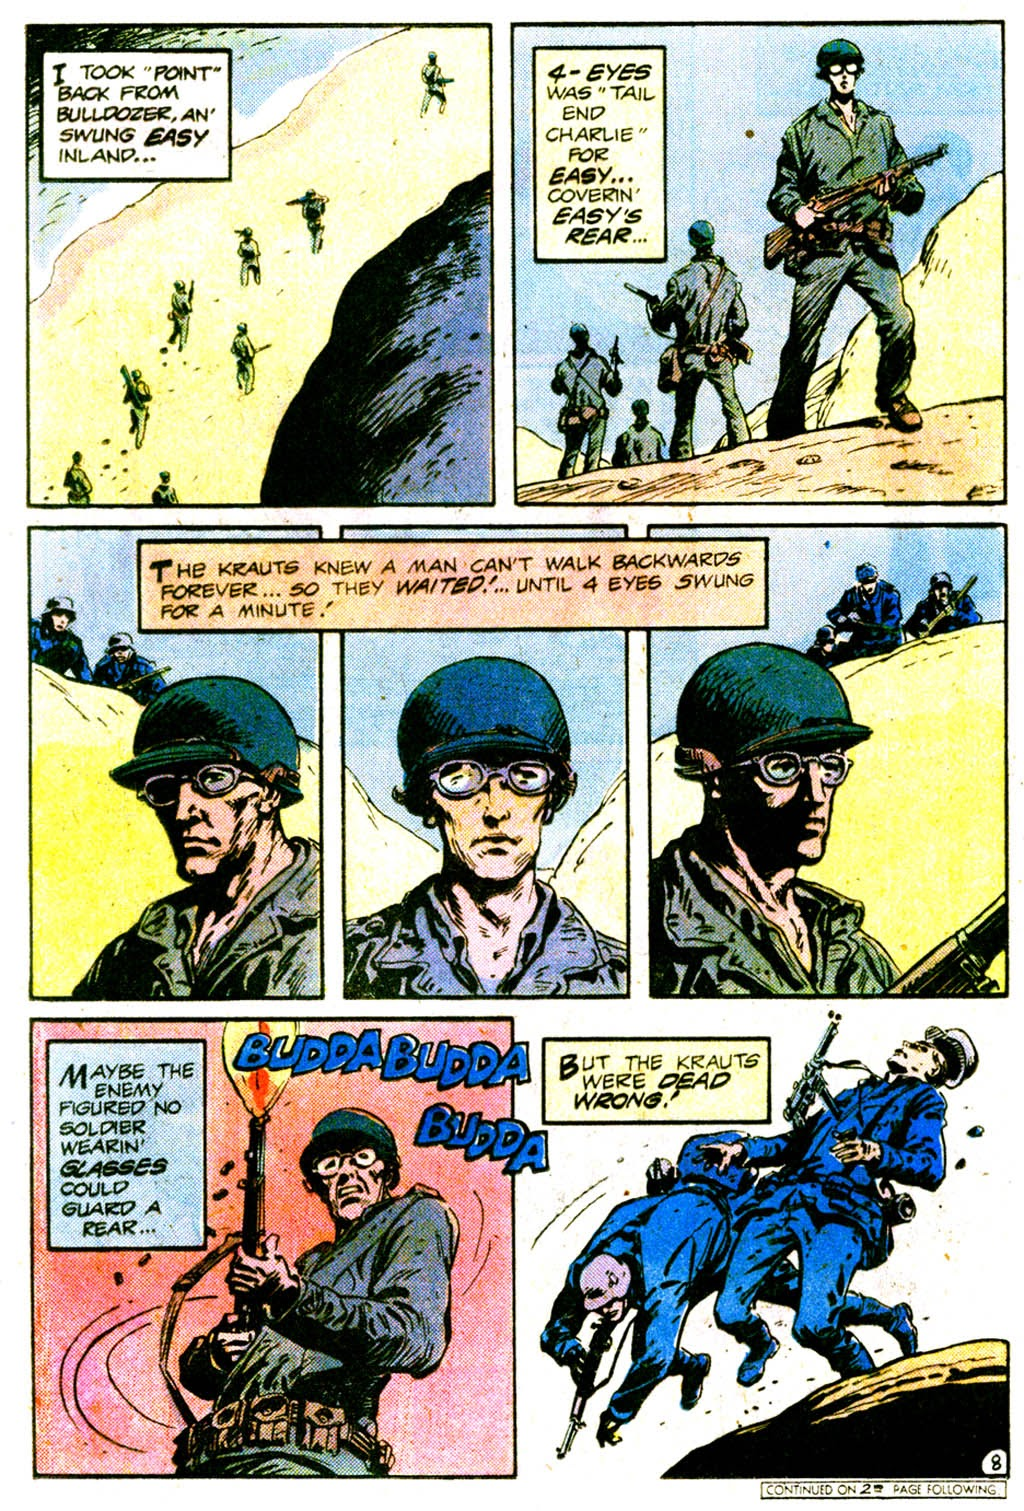 Read online Sgt. Rock comic -  Issue #365 - 11